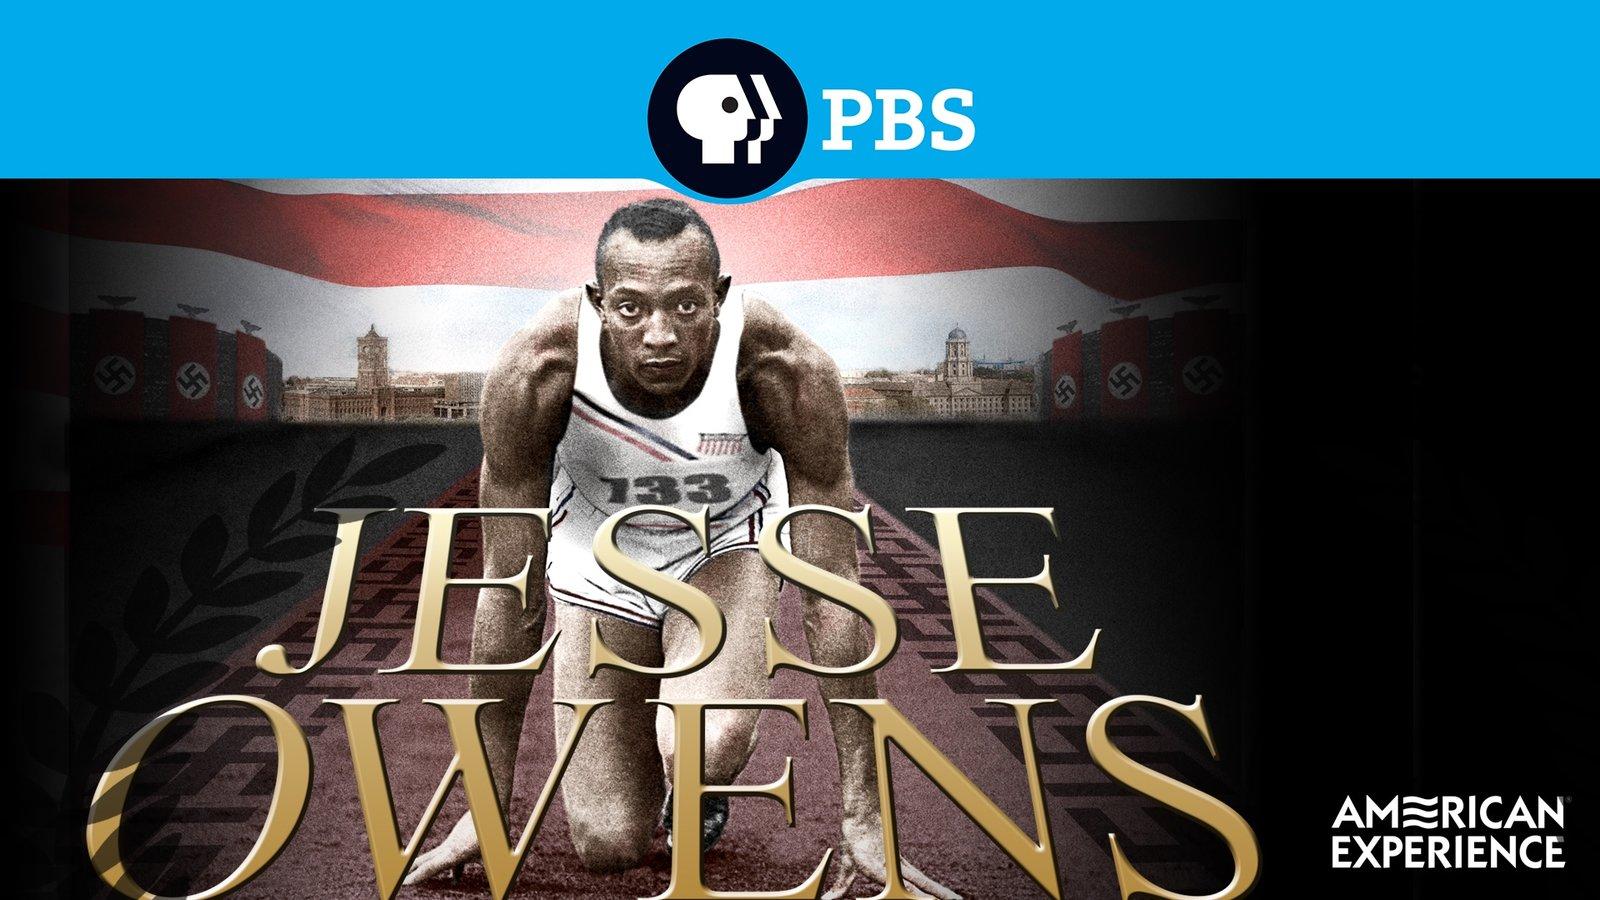 Jesse Owens - An Olympic Athlete